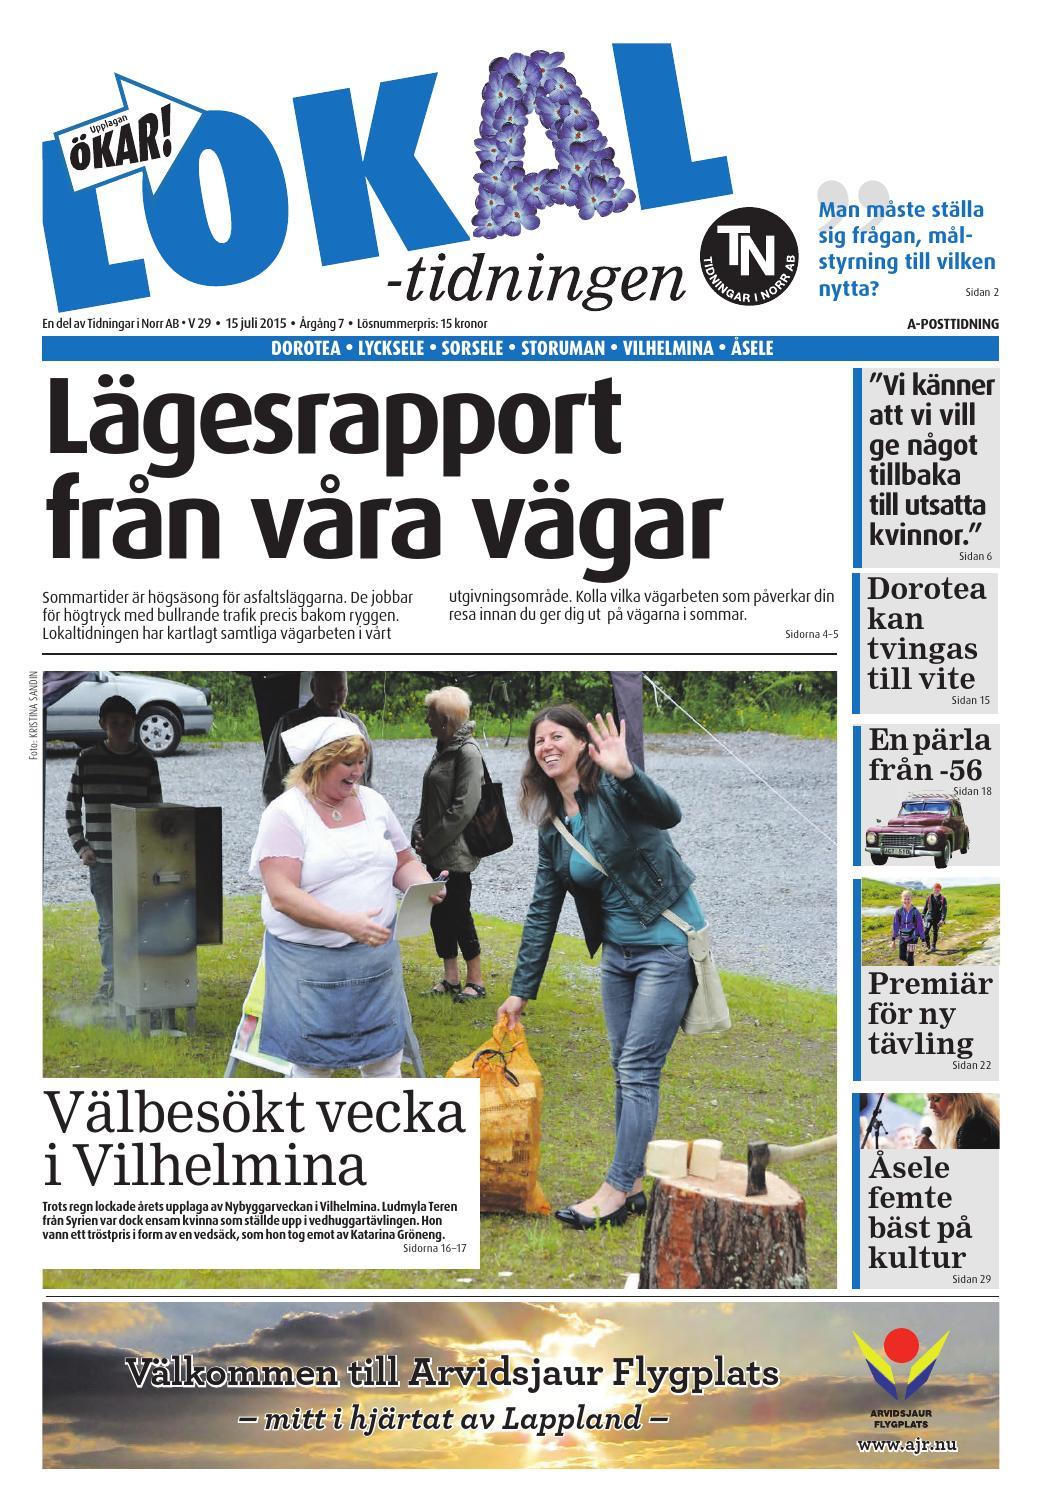 Annki, Kvinna, 62 | Hrnefors, Sverige | Badoo